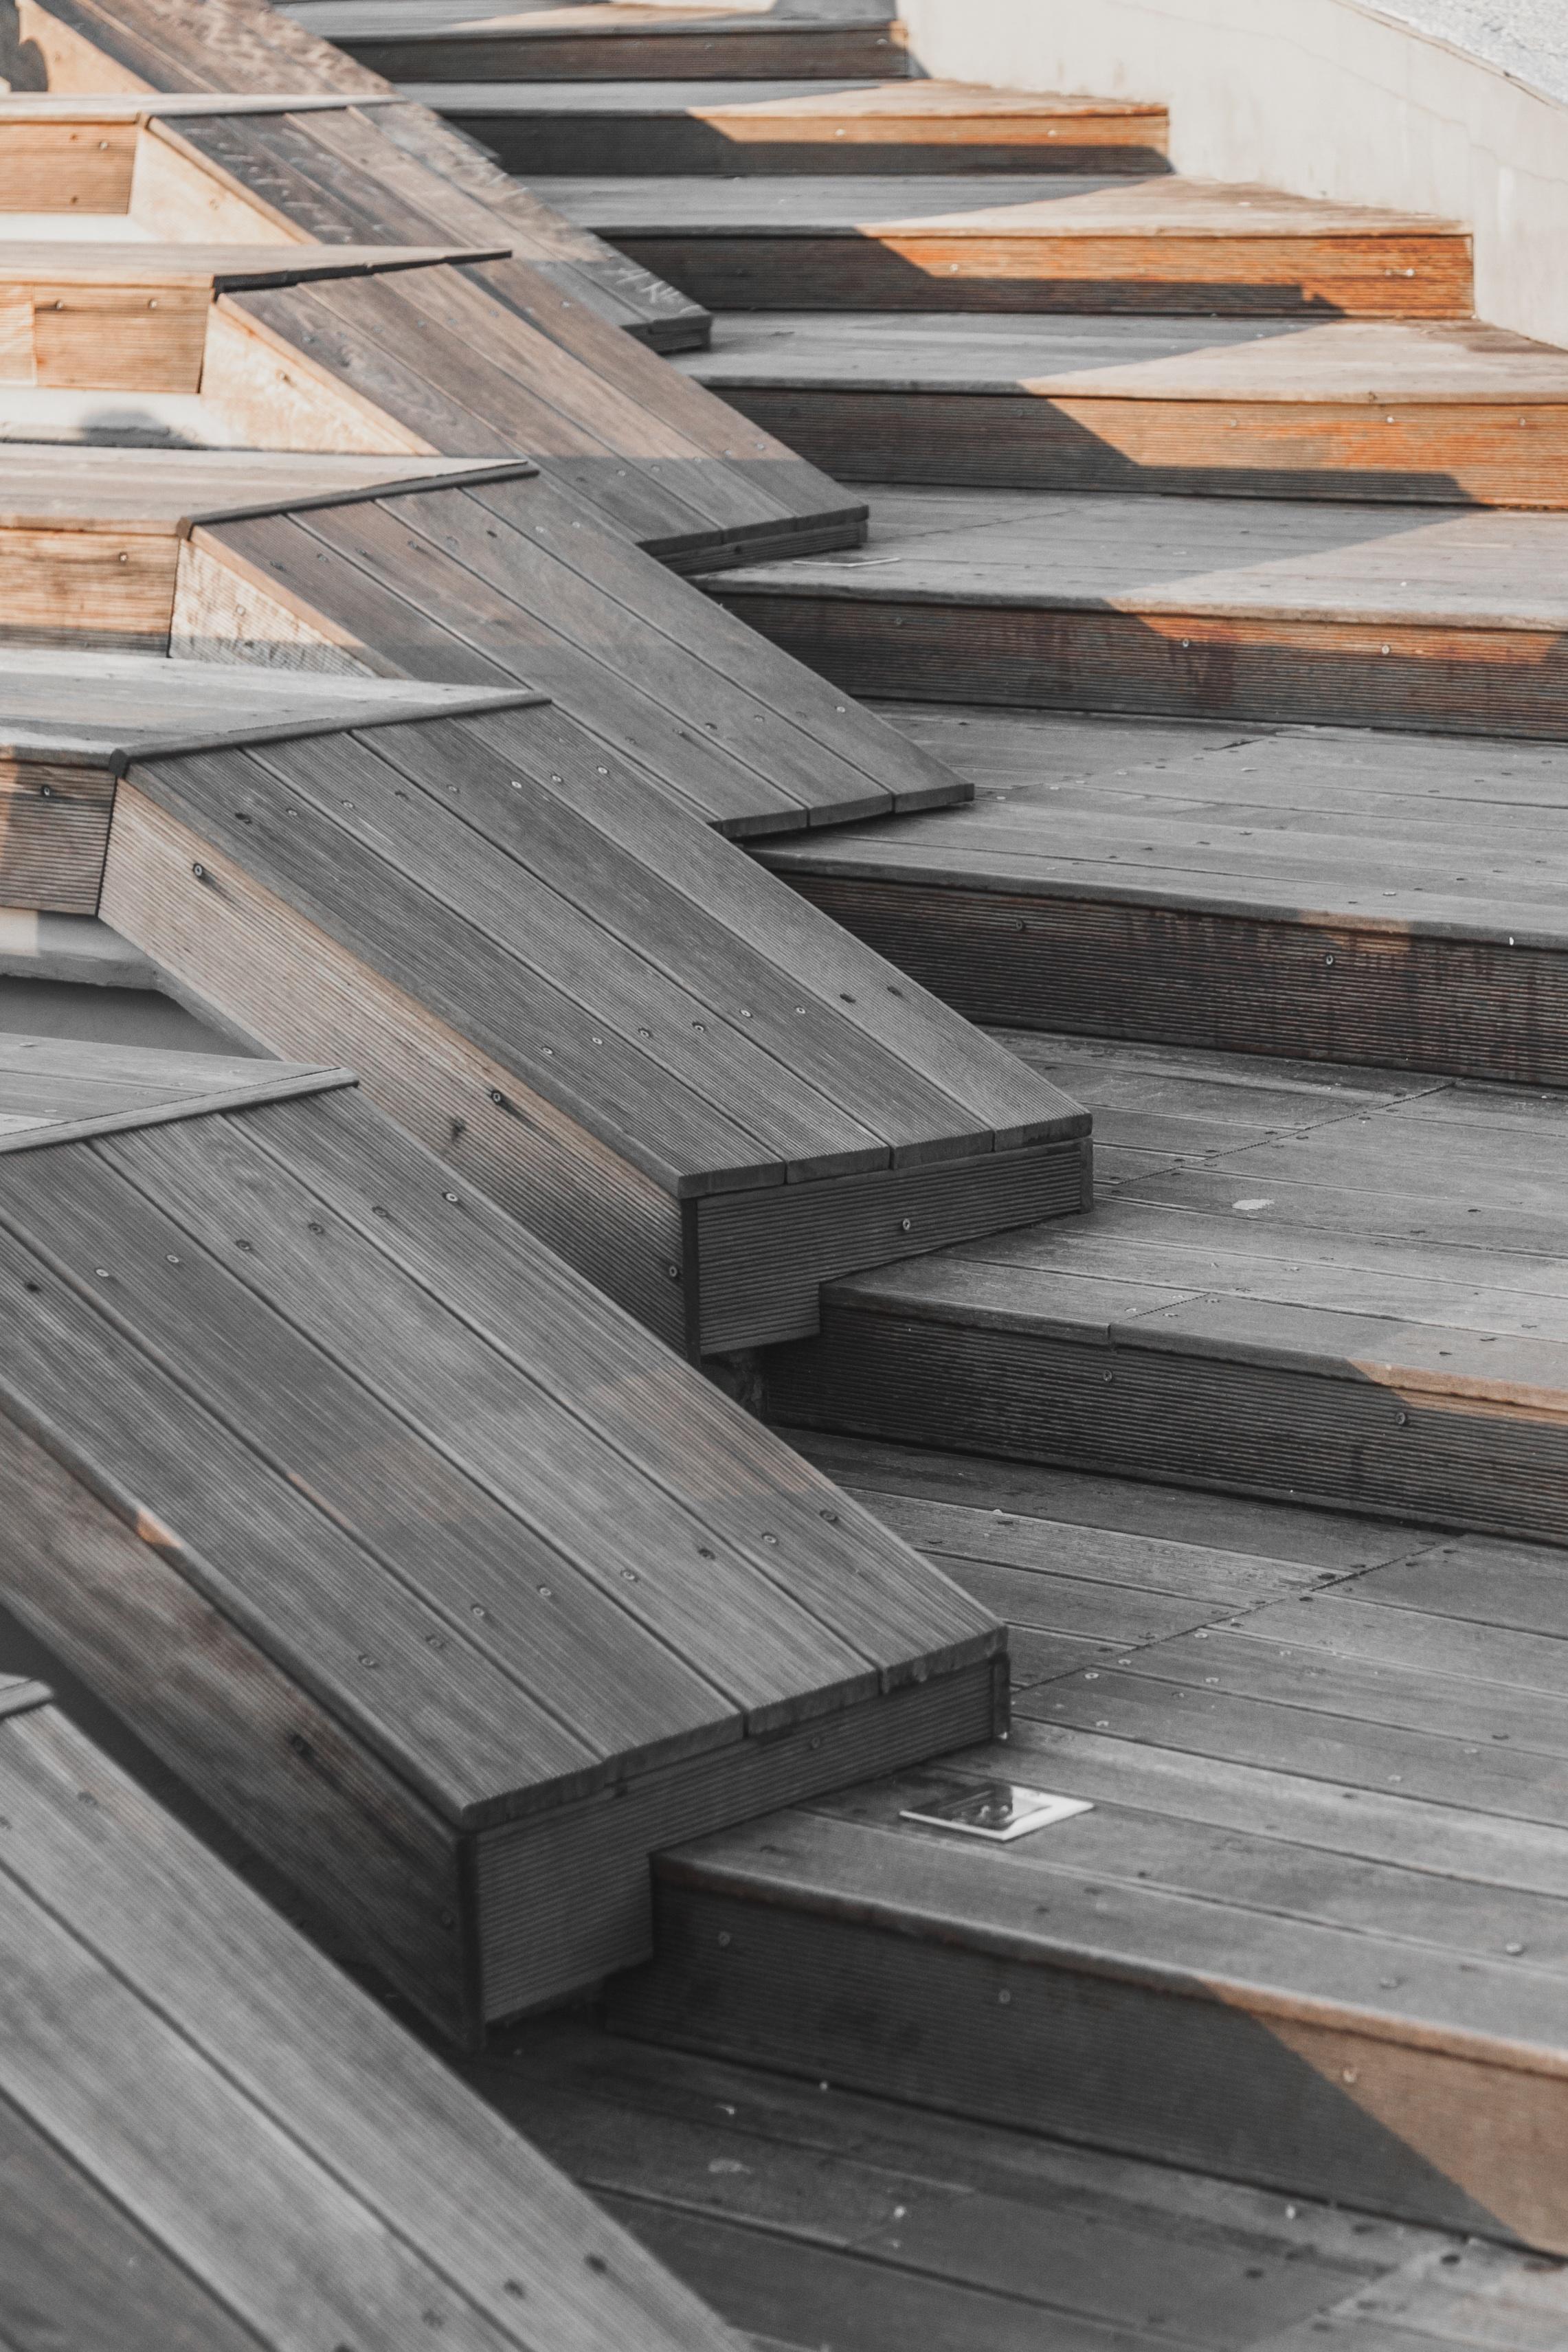 madera piso techo pasarela maderas madera dura escalera piso iluminacin natural suelos de madera estructura al